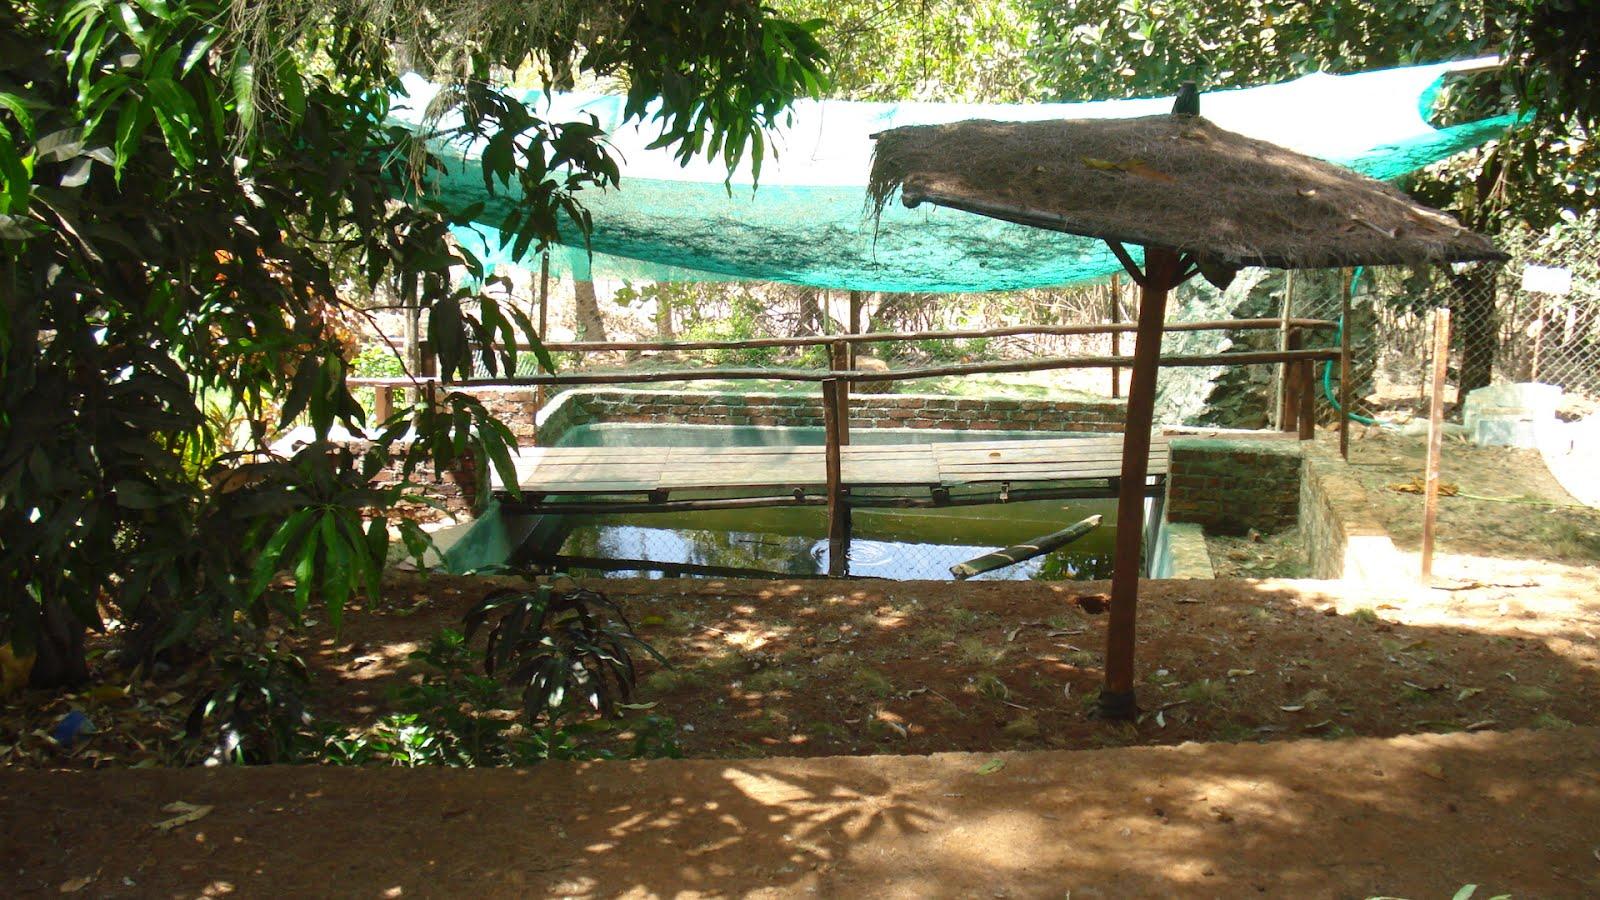 Places Near Mumbai: Rohini farm house at Vasai Virar for Farmhouse In Vasai For Picnic  110zmd